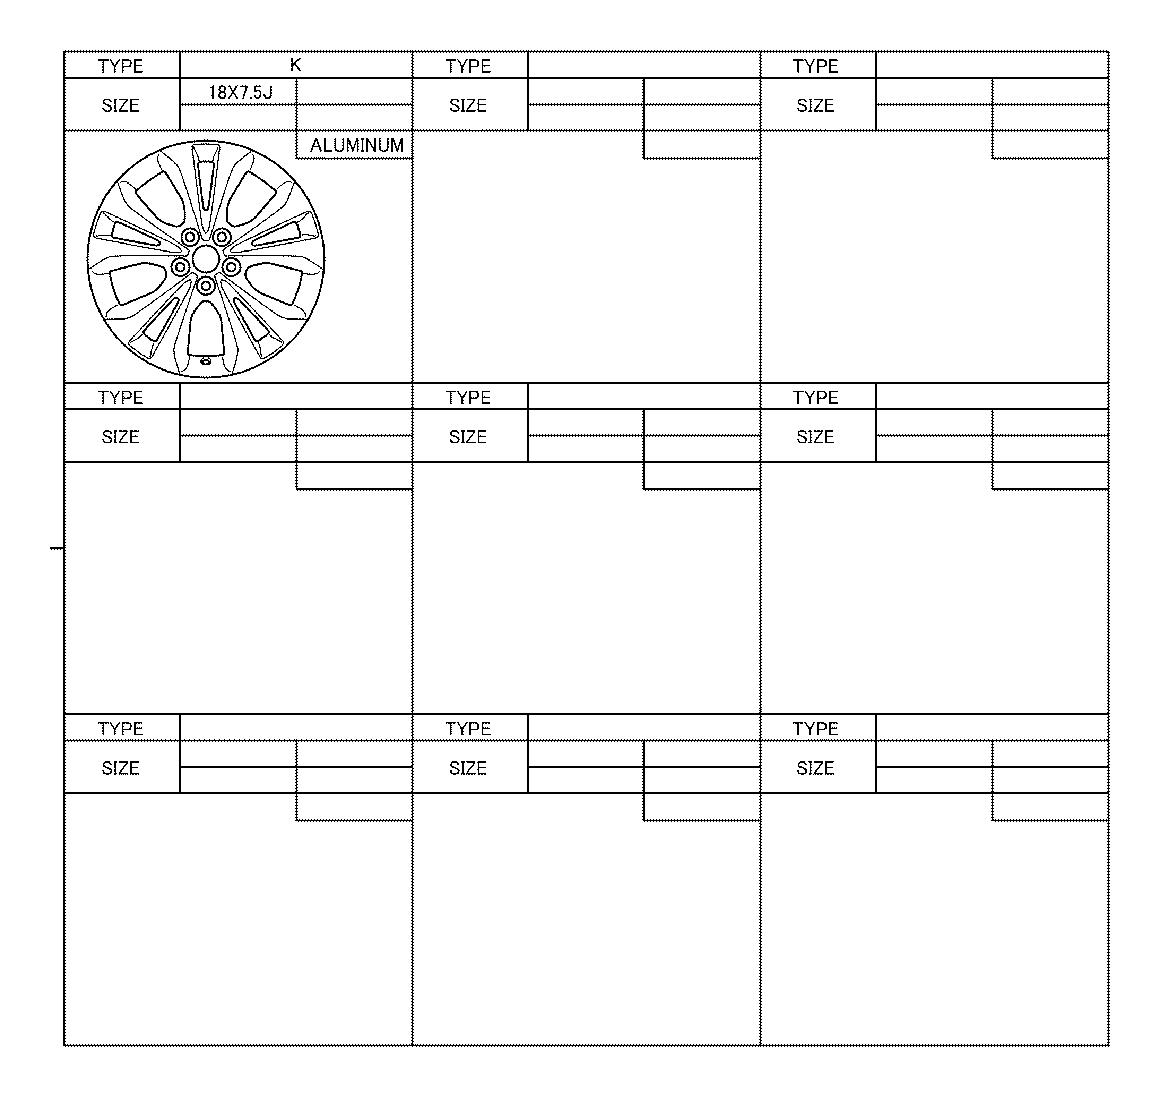 Lexus NX 200t Wheel, Disc. Tire, Summer, Spec